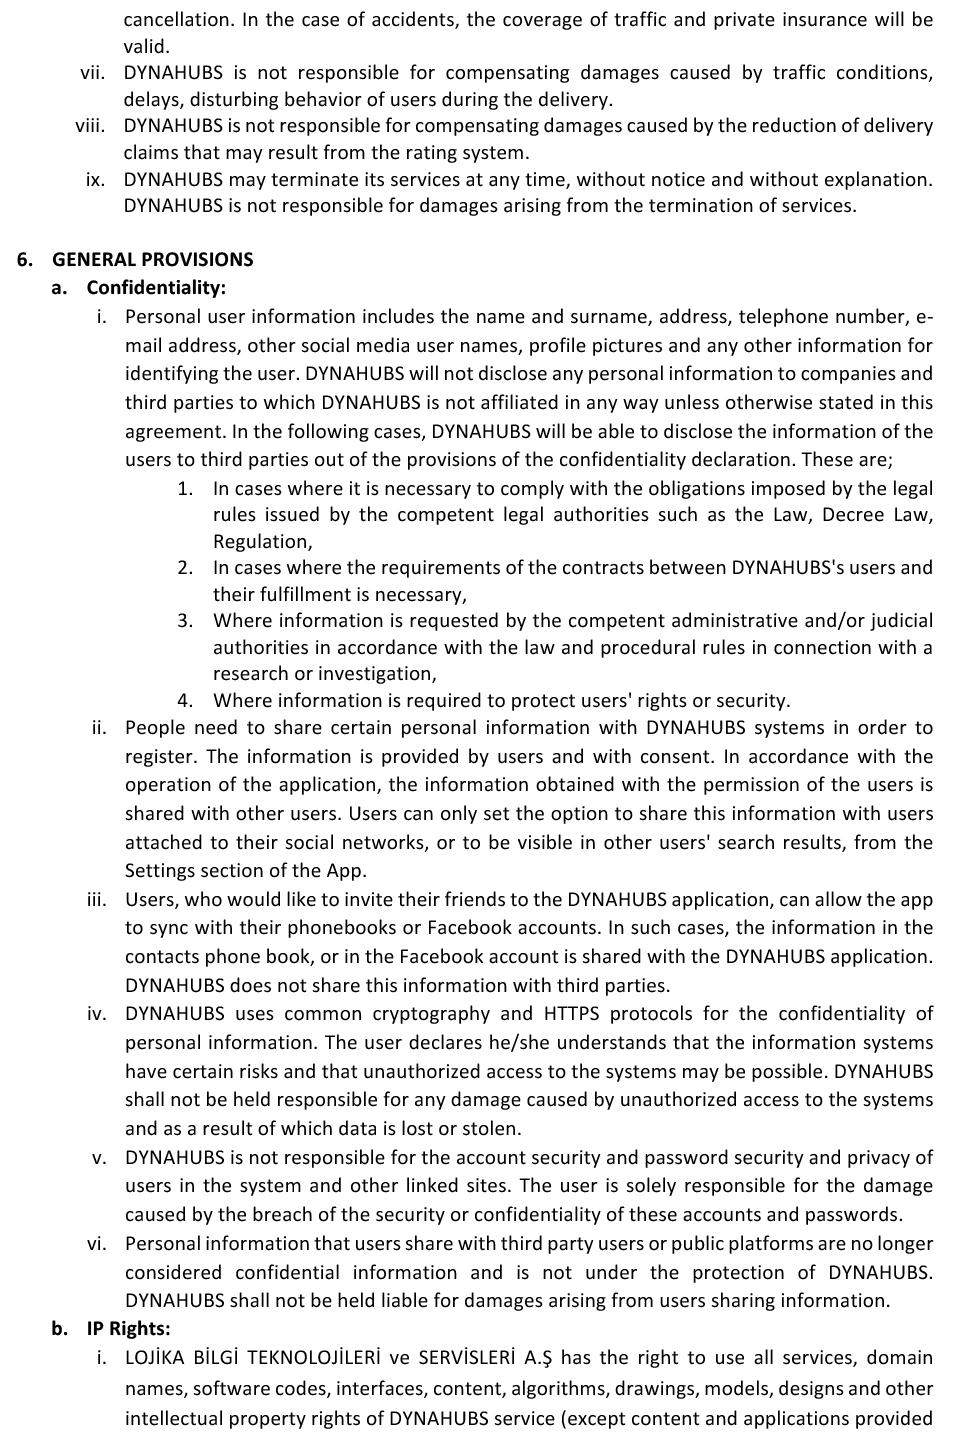 DynaHUBs_User-Agreement_3.1.2017_eng-5.jpg